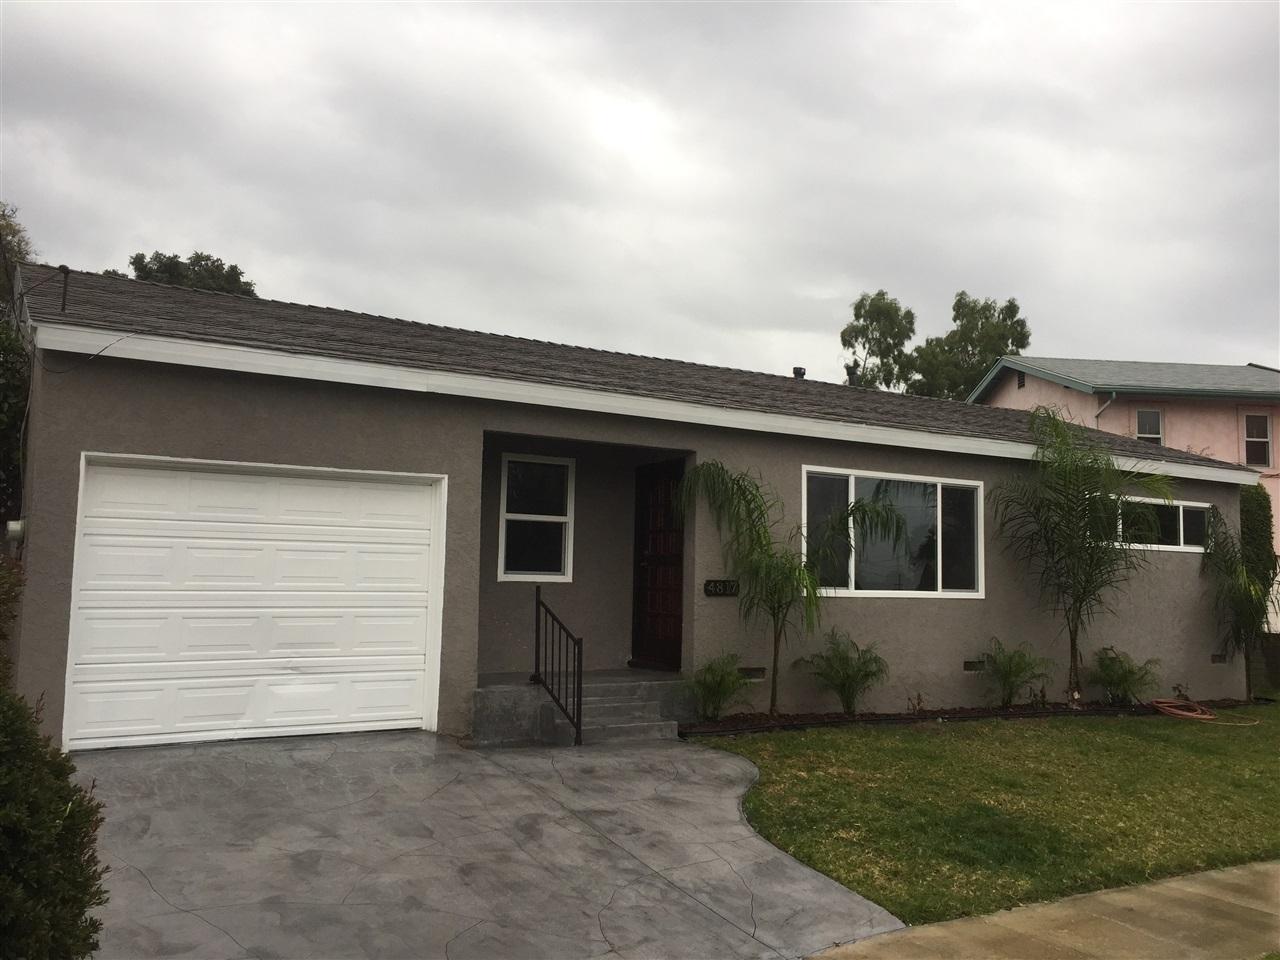 4817 Huron Ave San Diego CA 92117